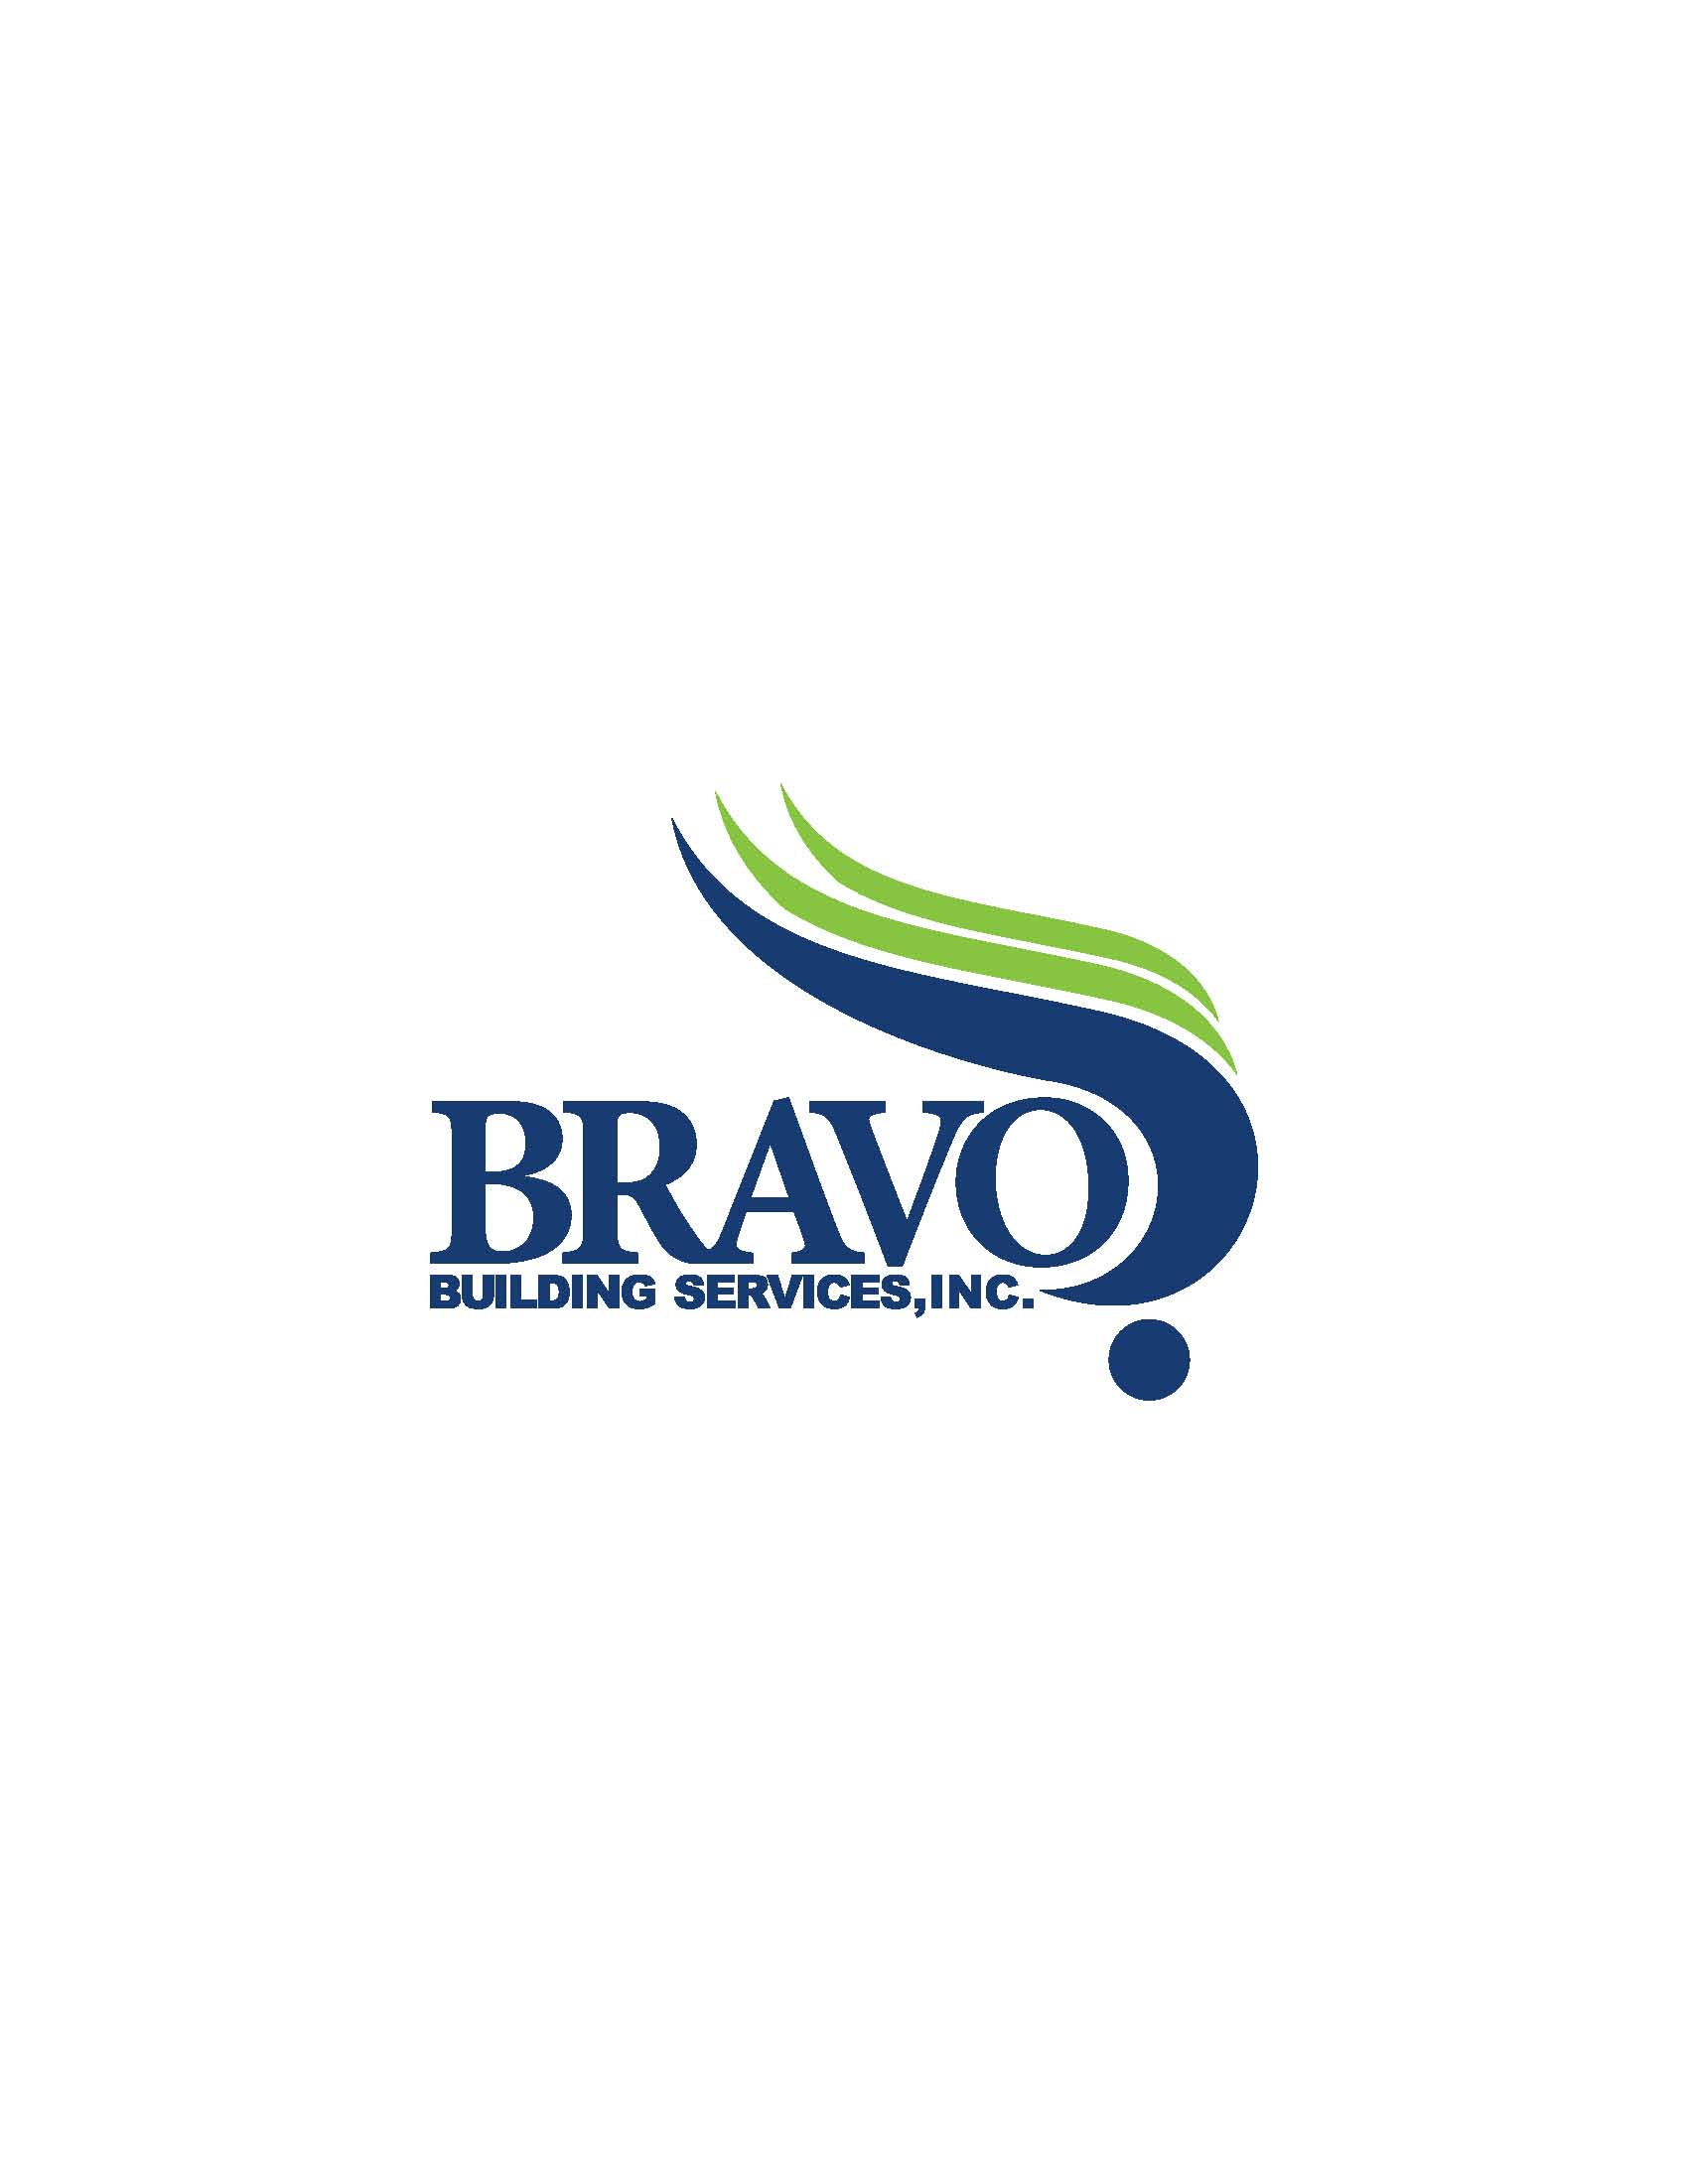 BRAVO! Building Services, Inc.